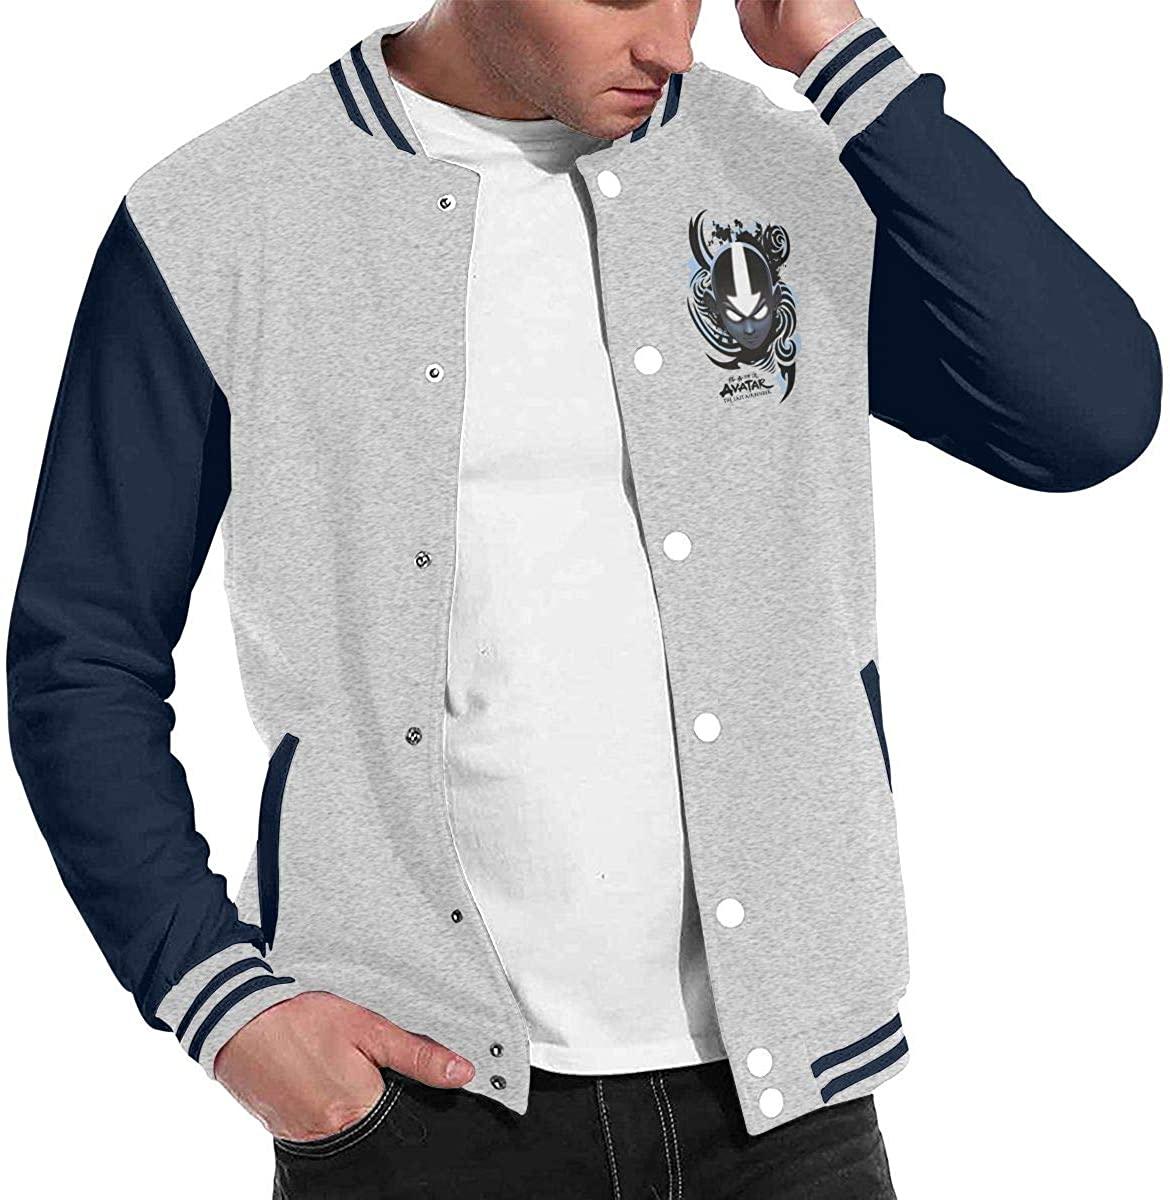 Avatar The Last Airbender Unisex Hipster Baseball Uniform Jacket Sport Coat Black Gray